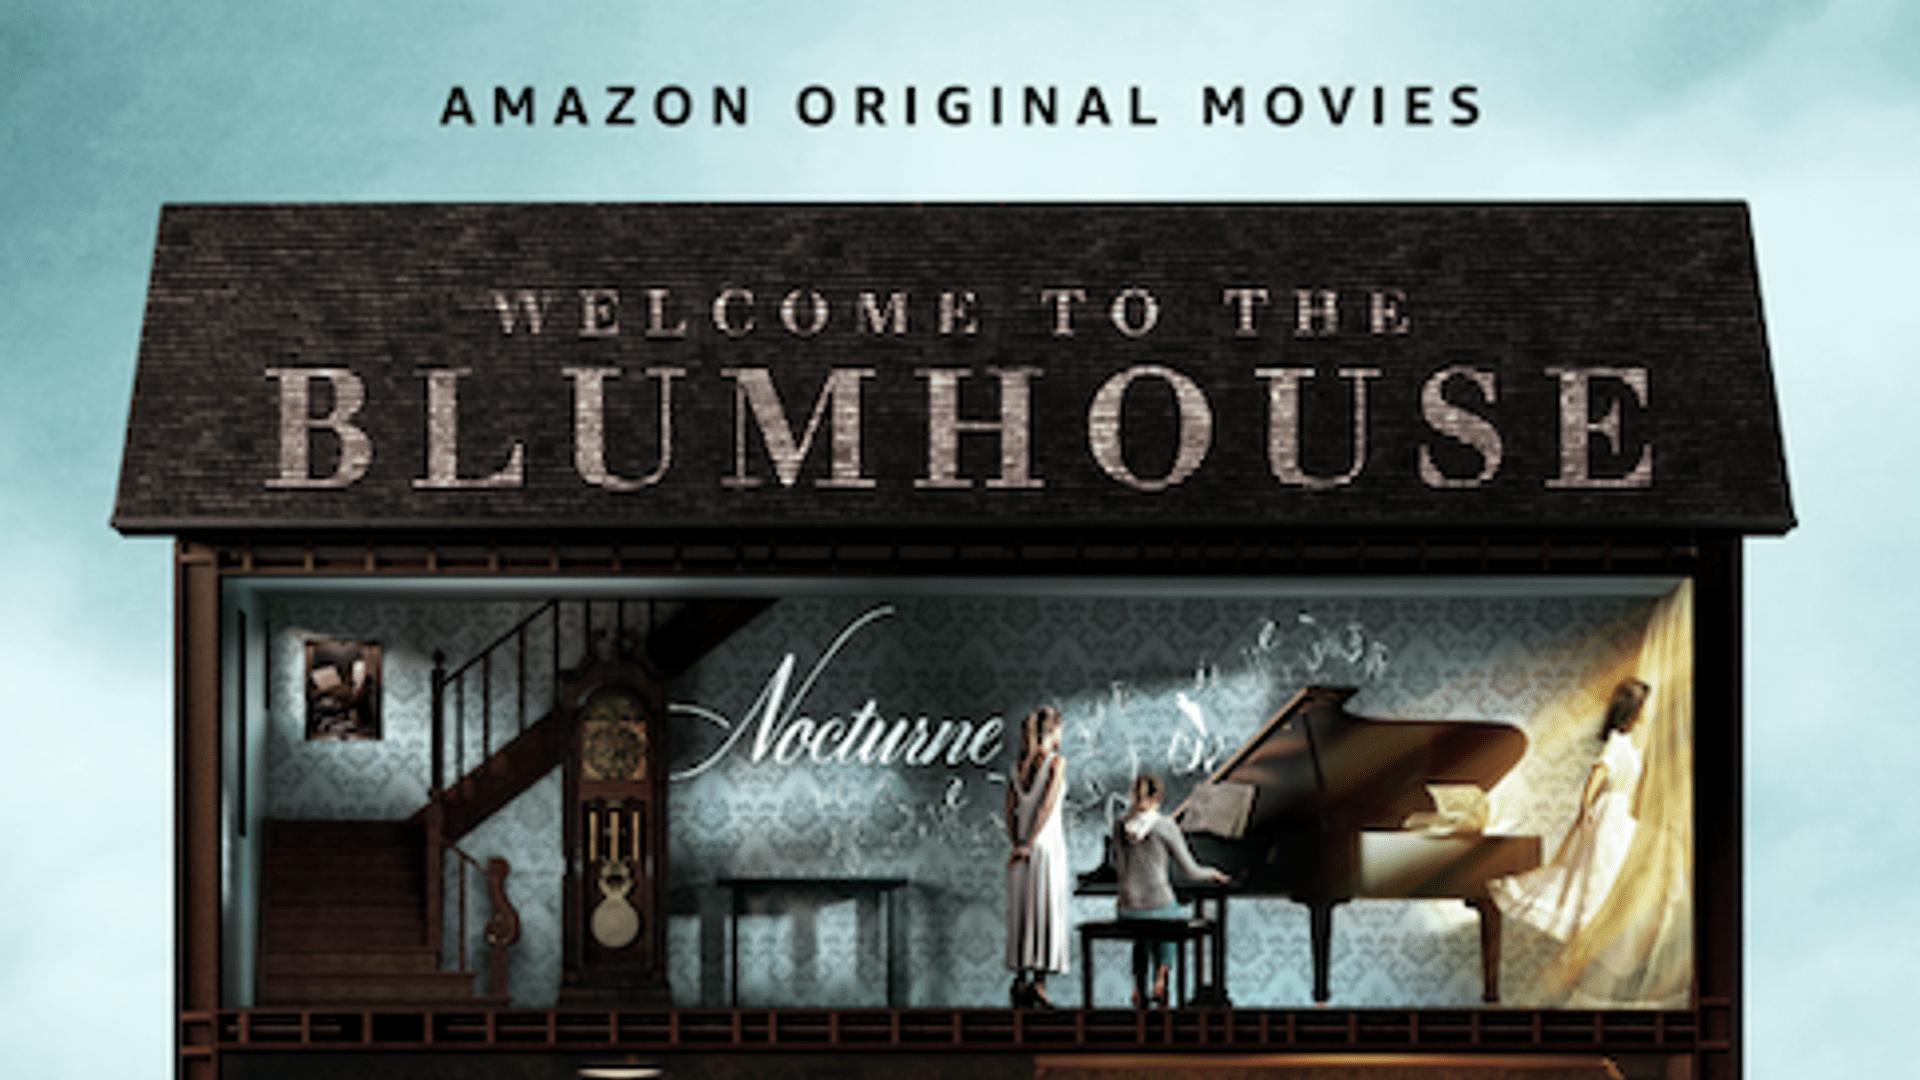 Blumhouse and Amazon Studios Detail Collaboration Set to Yield 8 Original Thriller Films